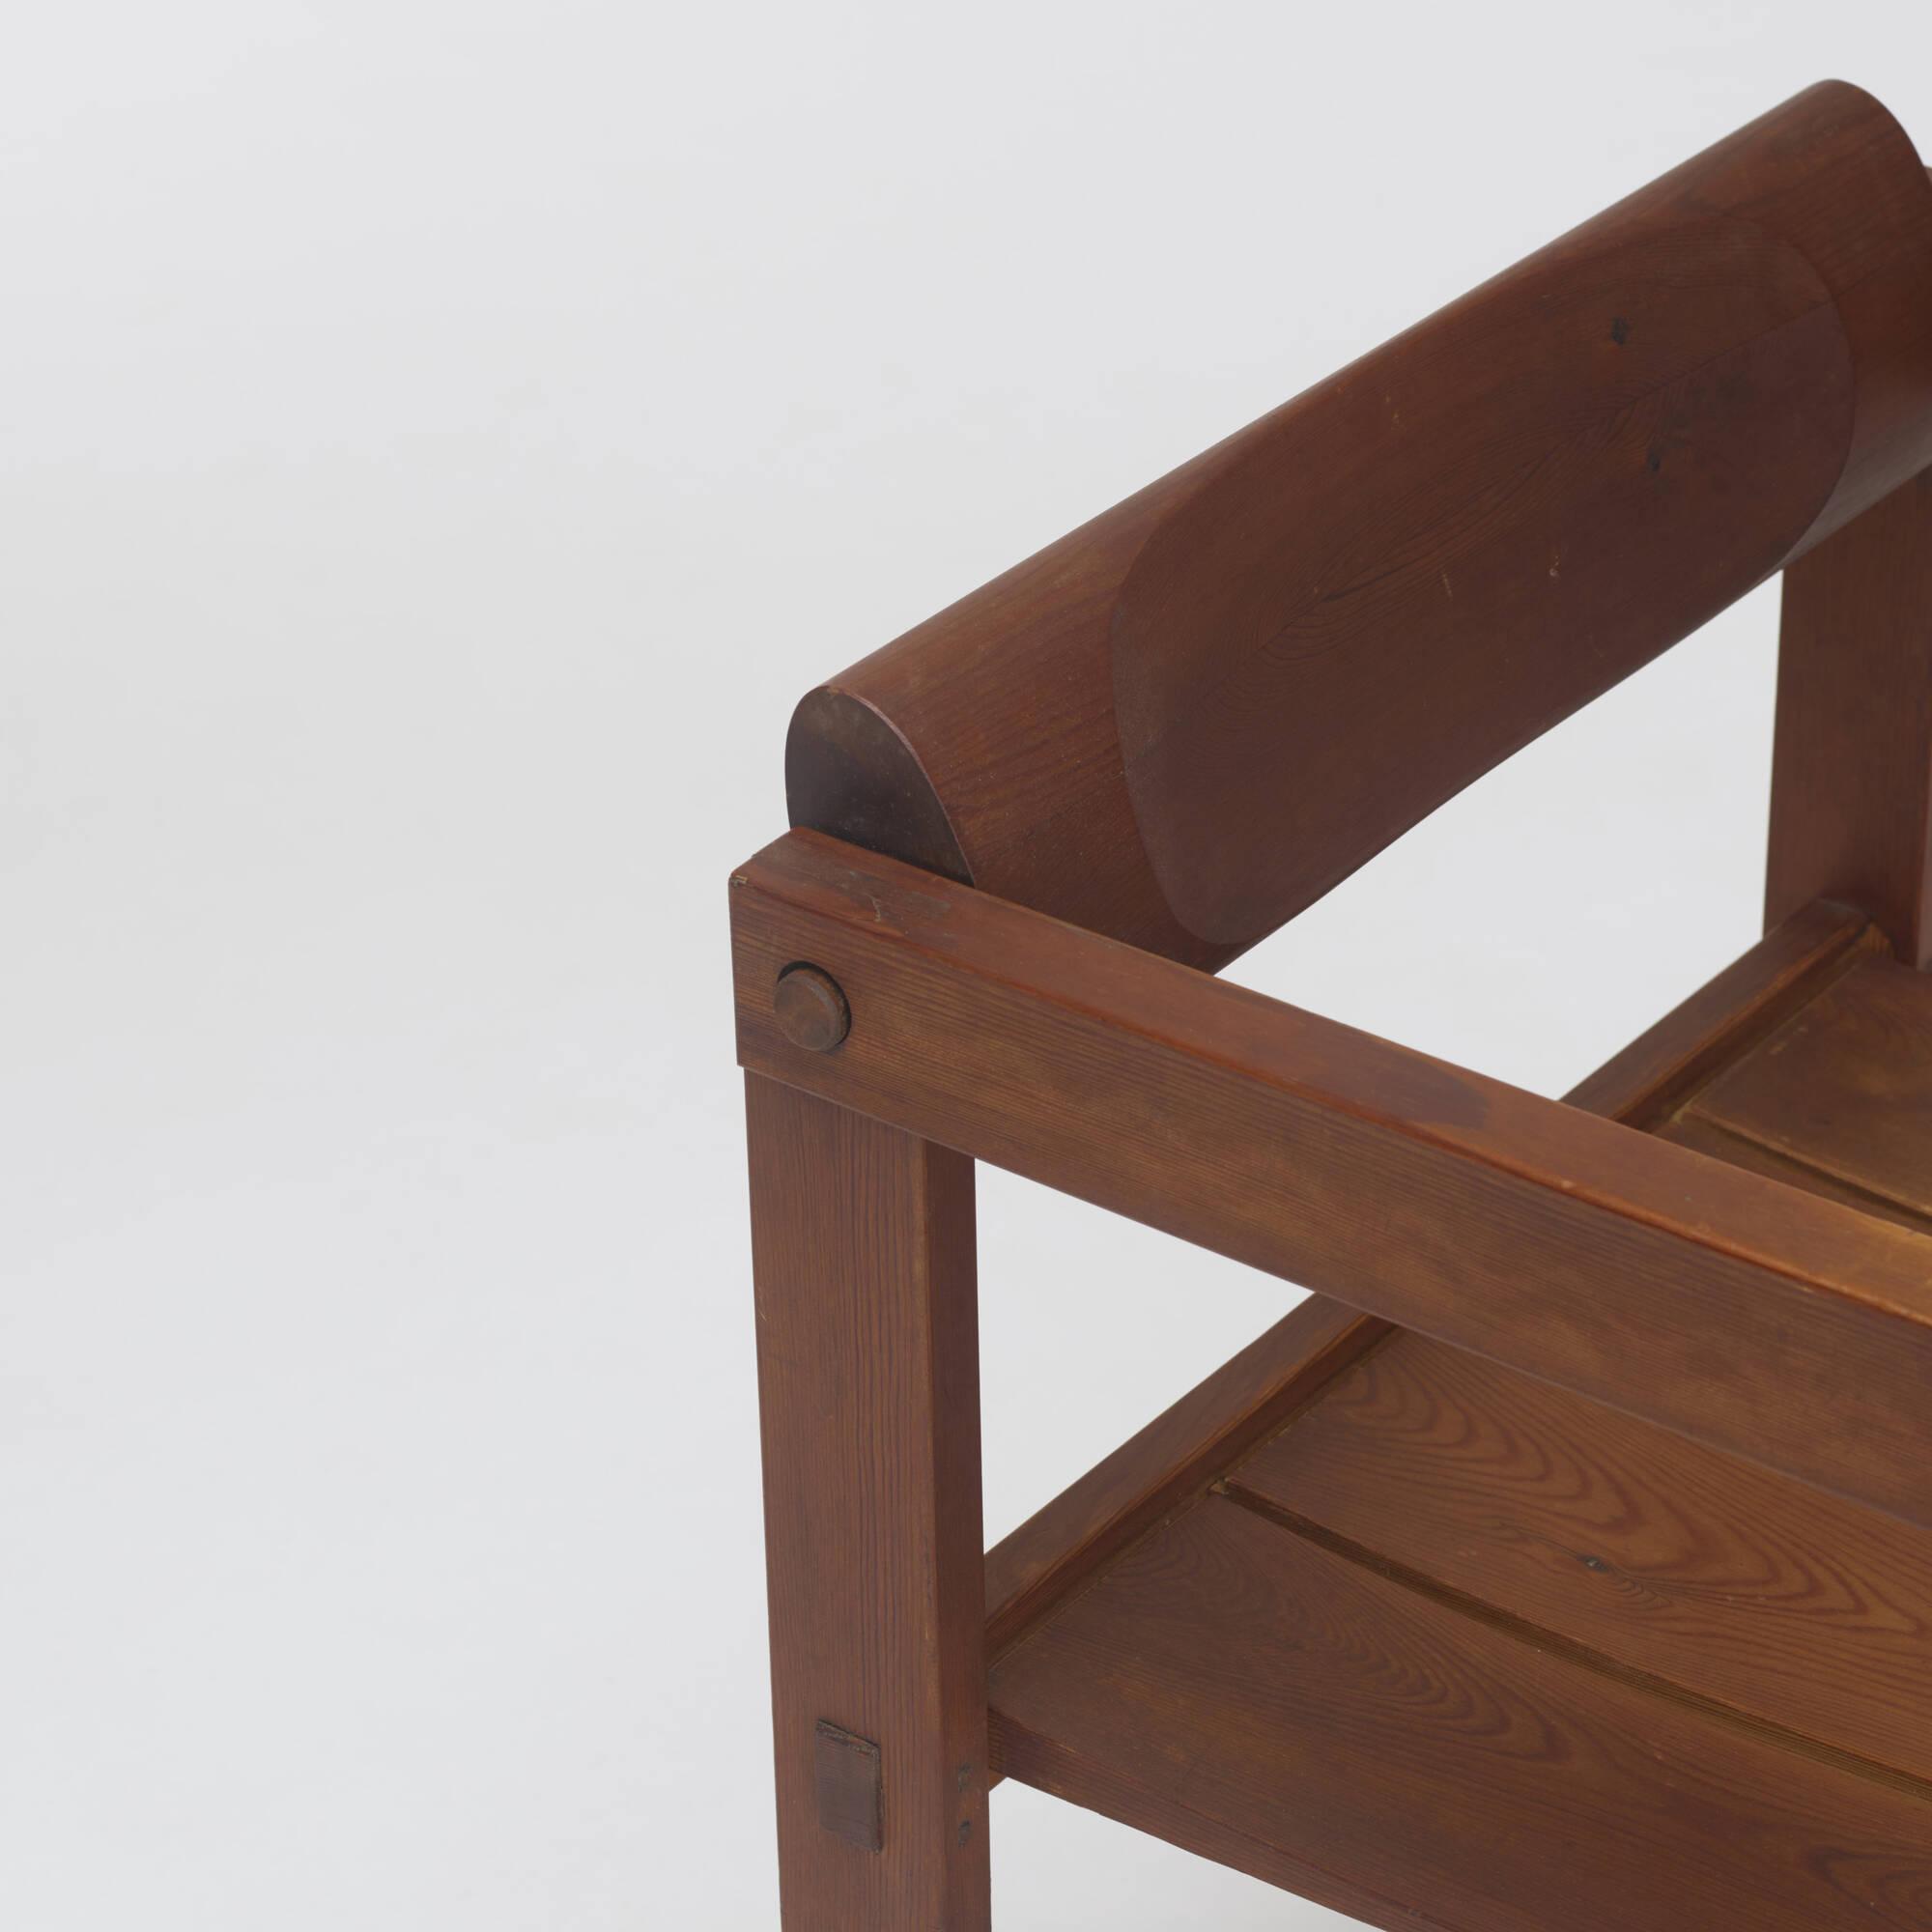 142: Edwin Helseth / Tybo armchair (3 of 3)